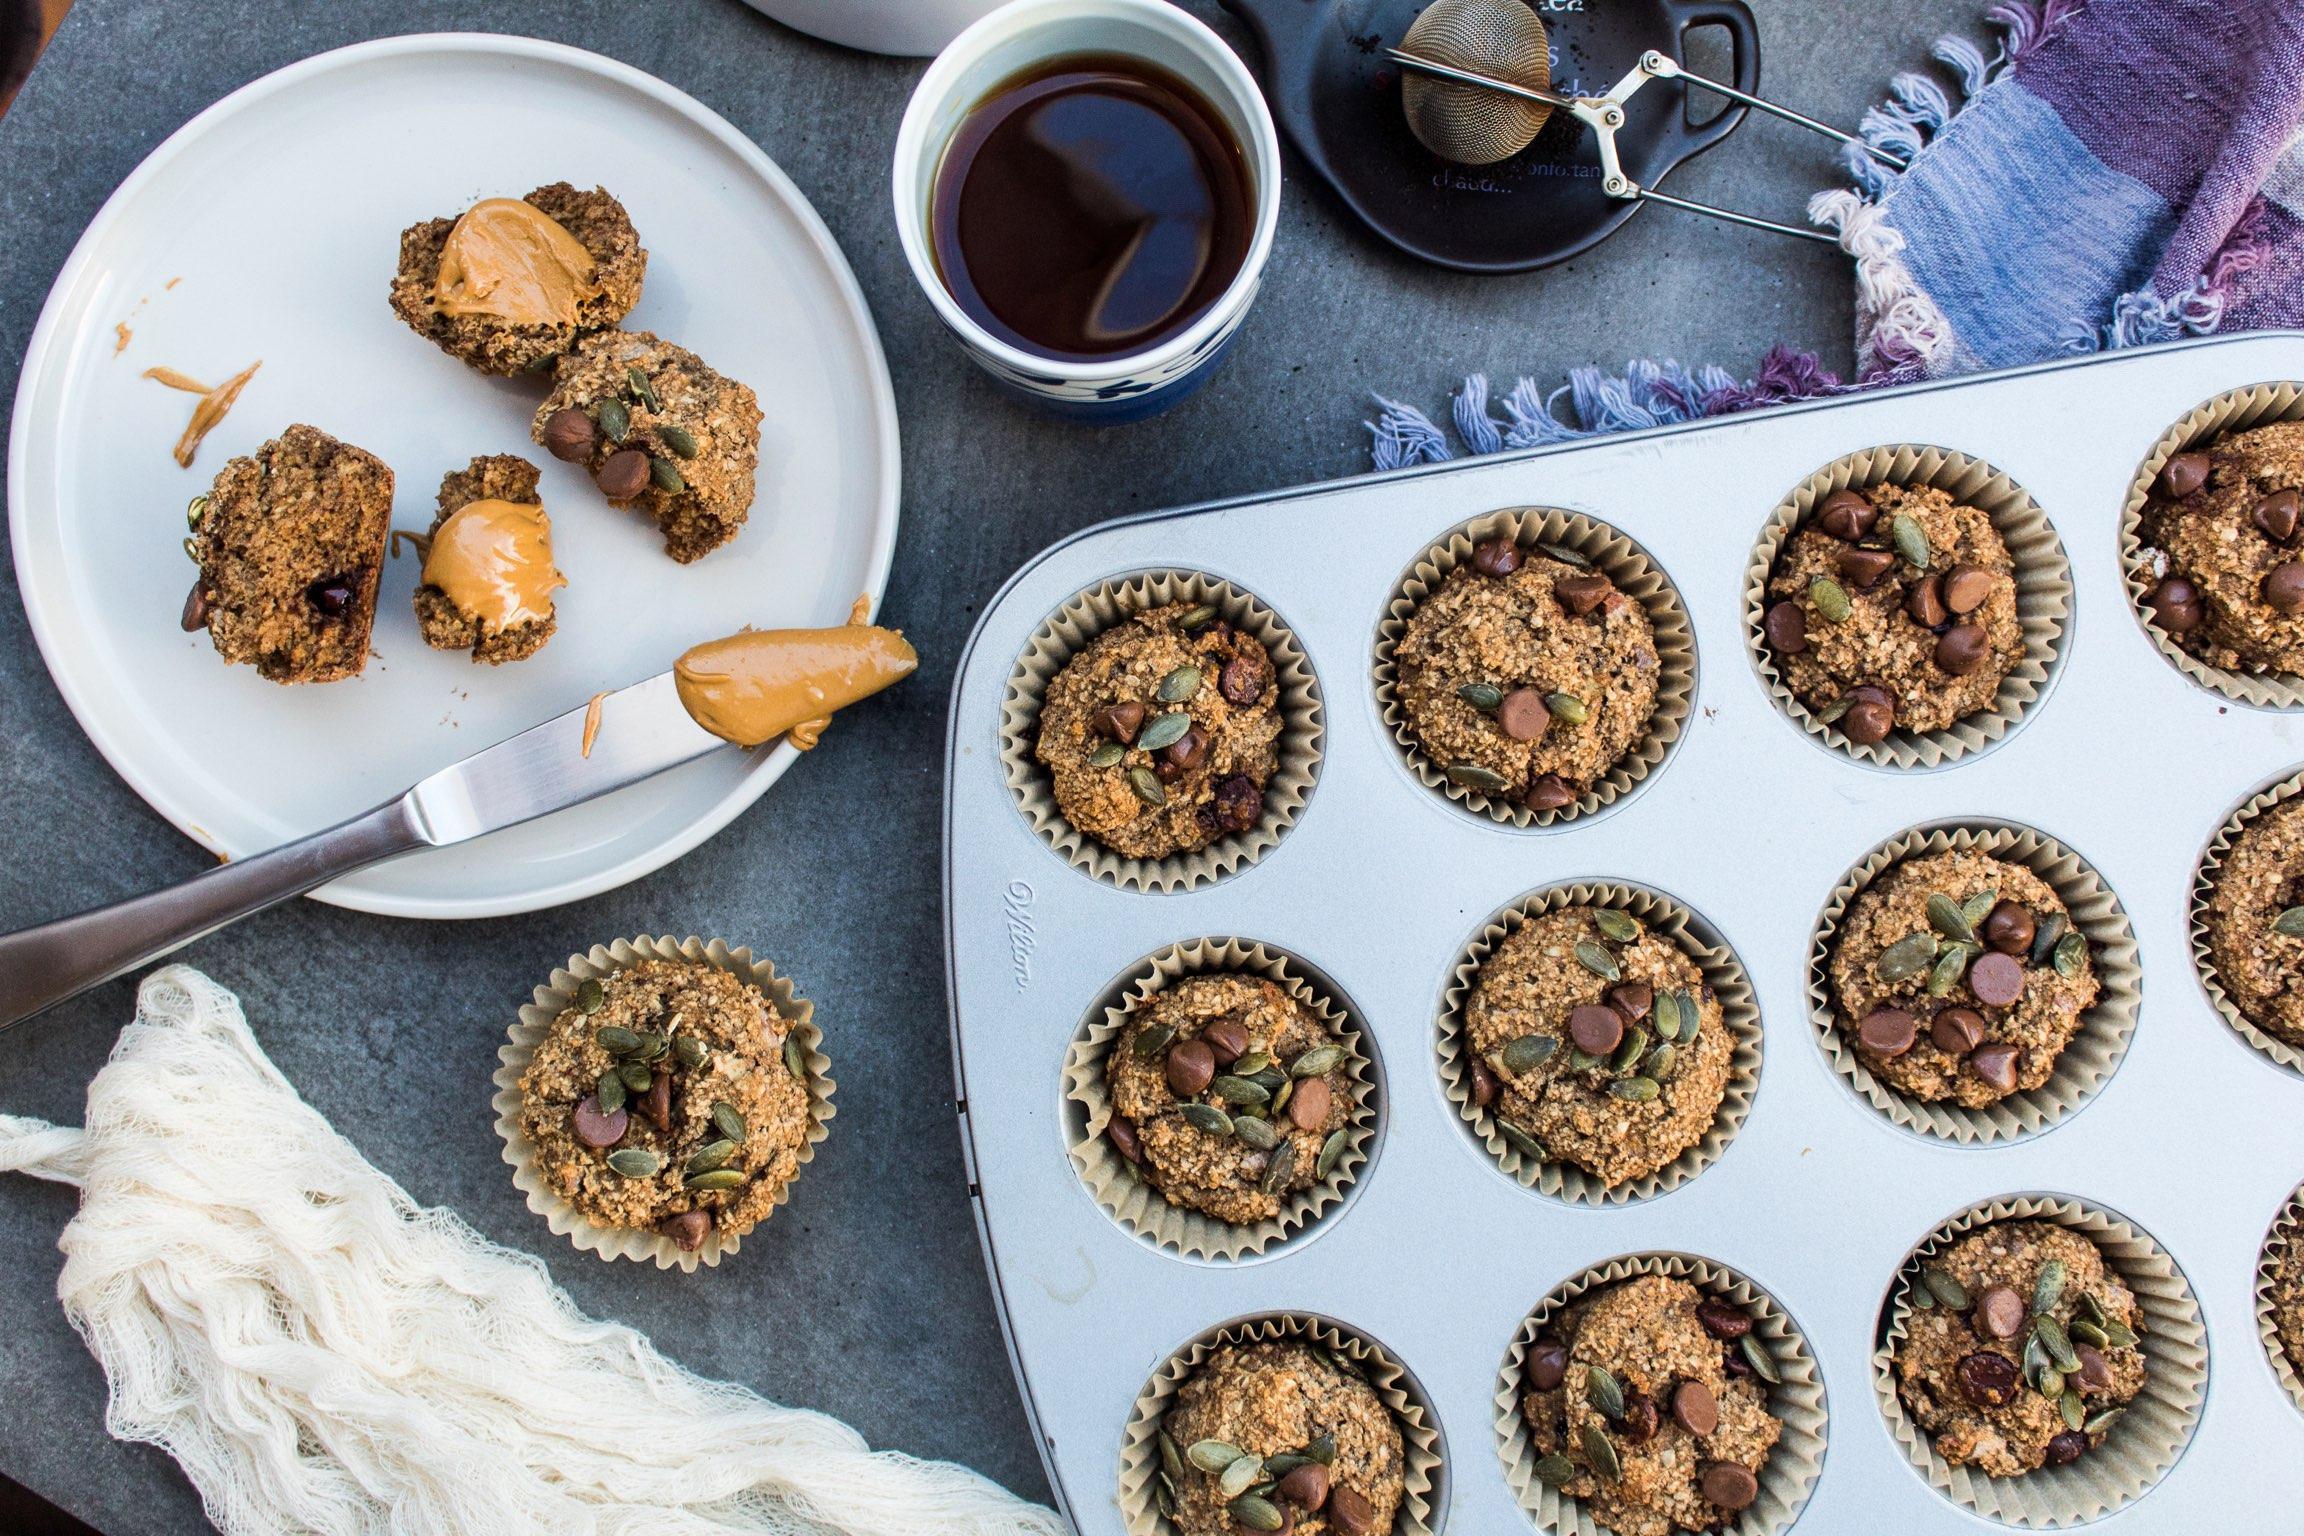 Oatflour chocolate chip banana nut muffins